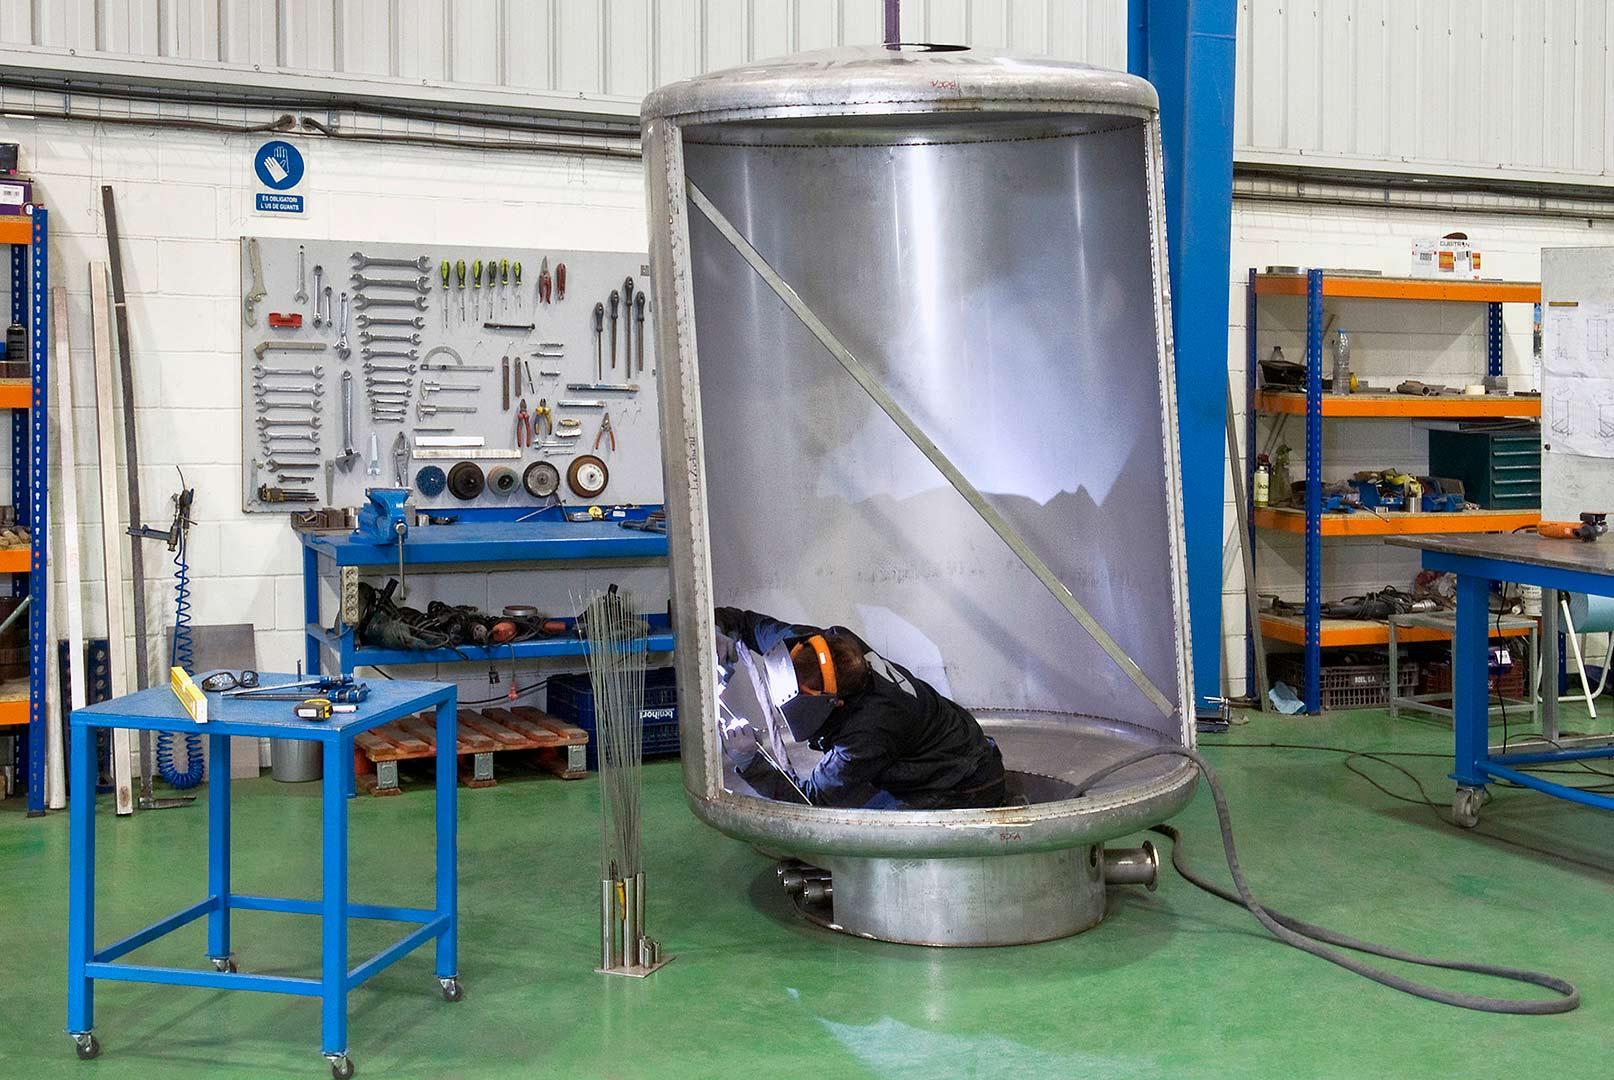 Metalaym, producte inox, grans dimensions, estructura, tolves, dipòsits